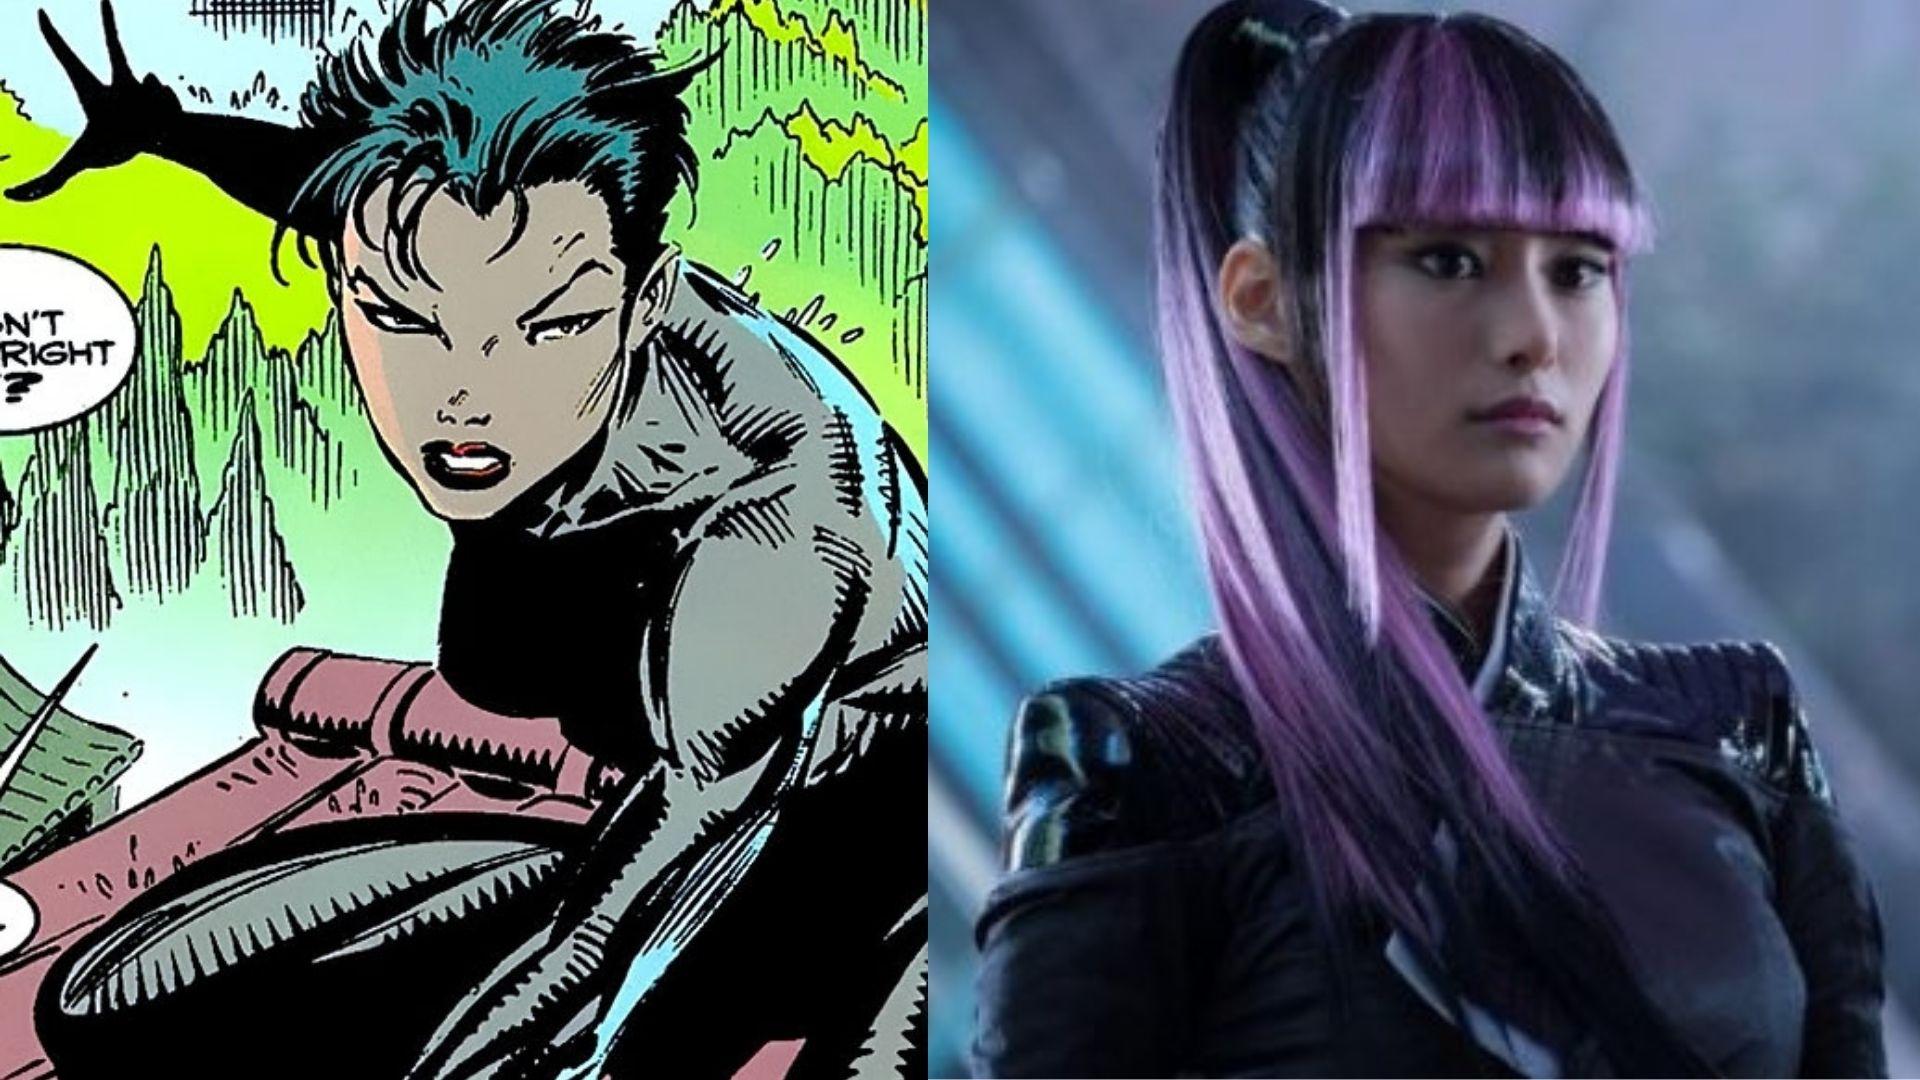 【X-メン】ユキオの強さ・能力について解説!【マーベル原作】